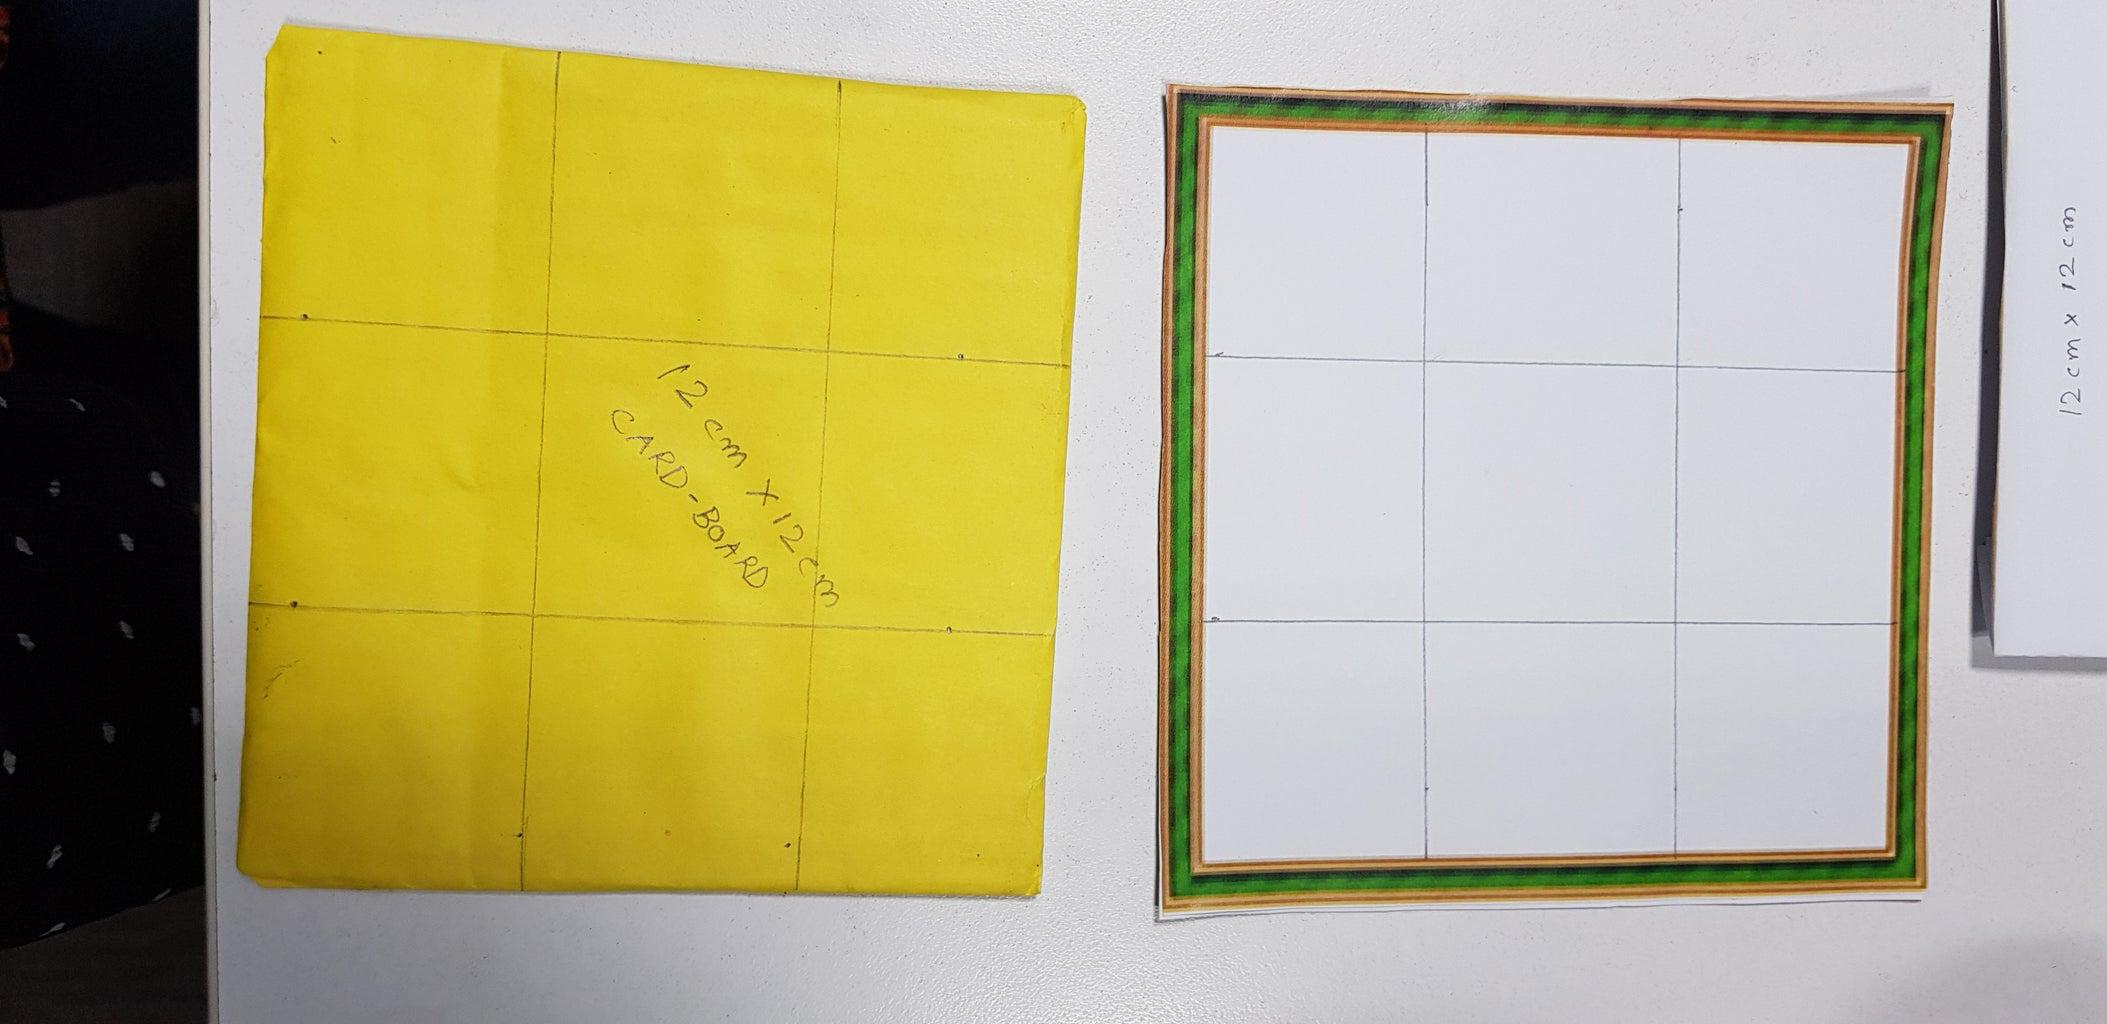 Making of Tic Tac Toe Board